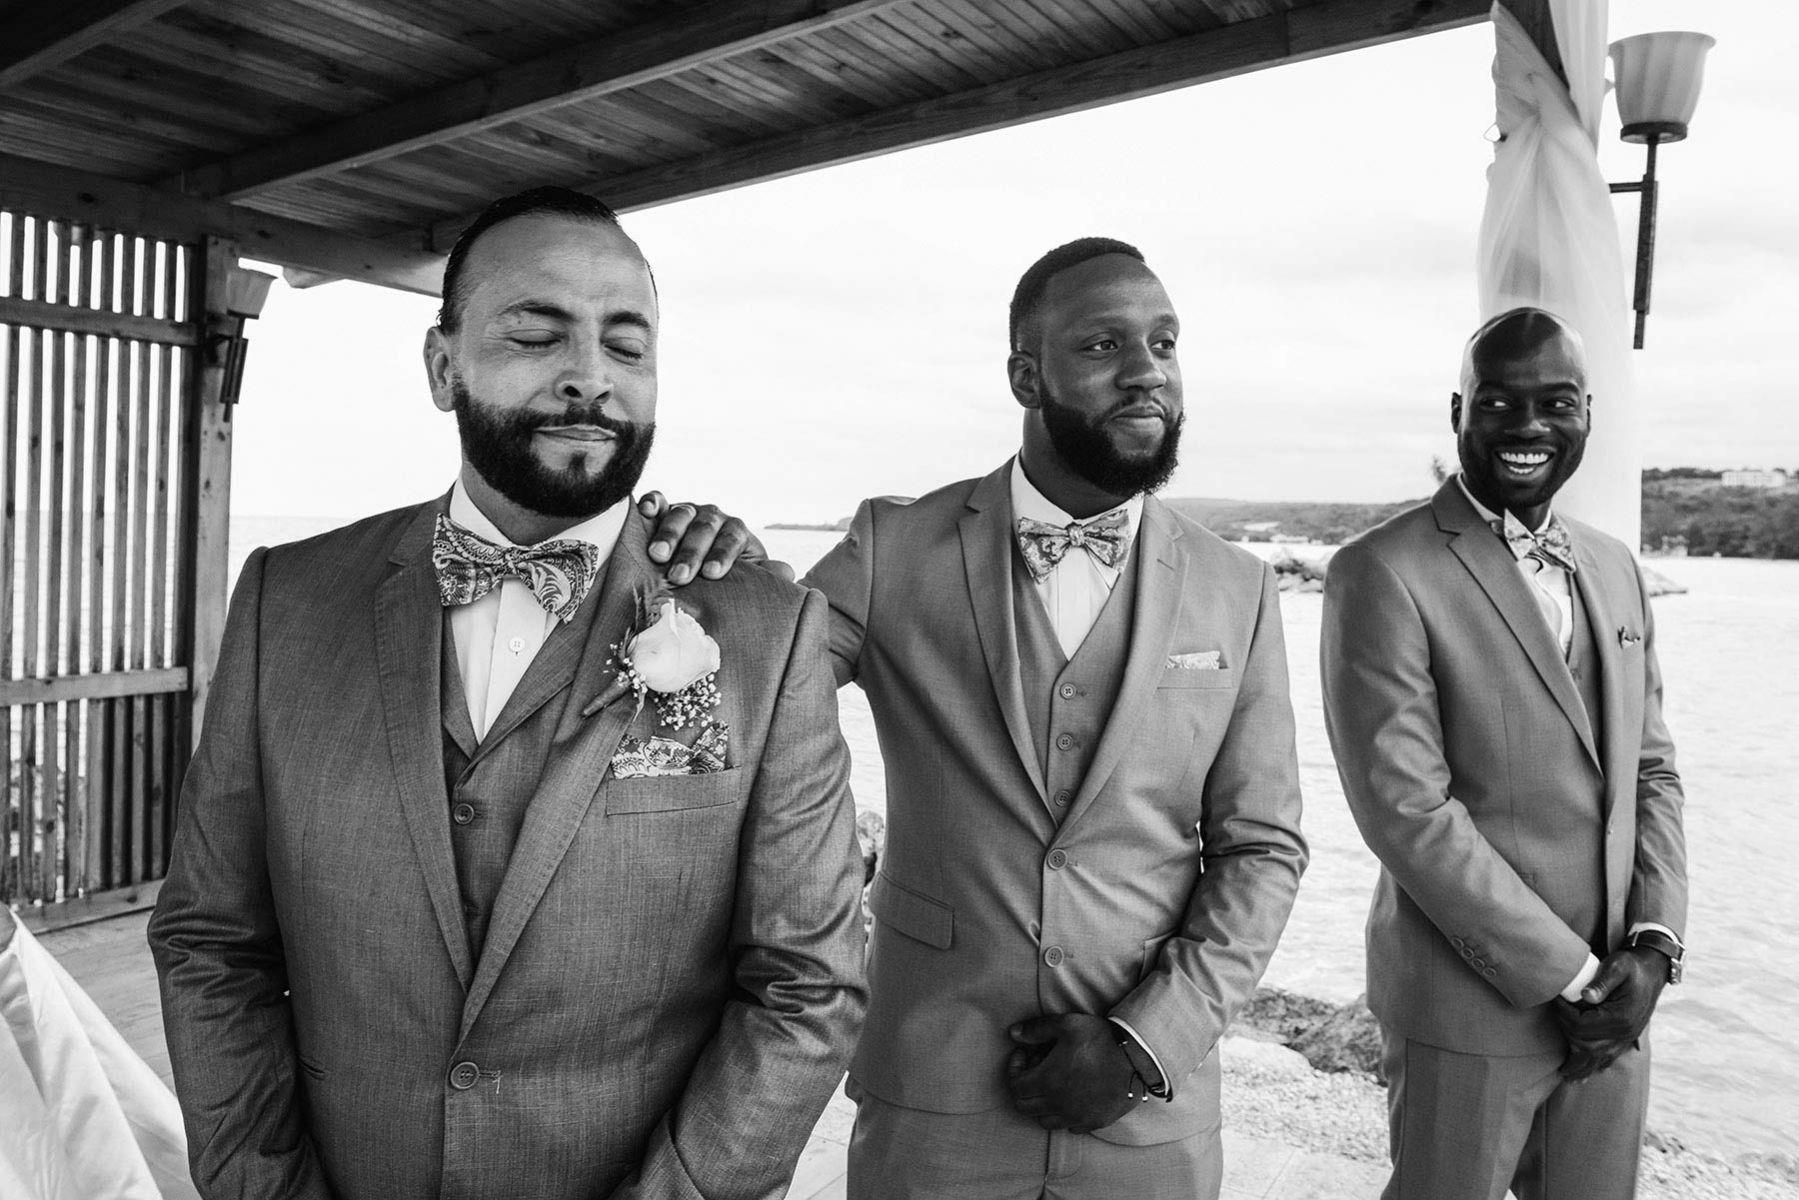 Wedding ceremony in Jamaica, emotional groom's reaction